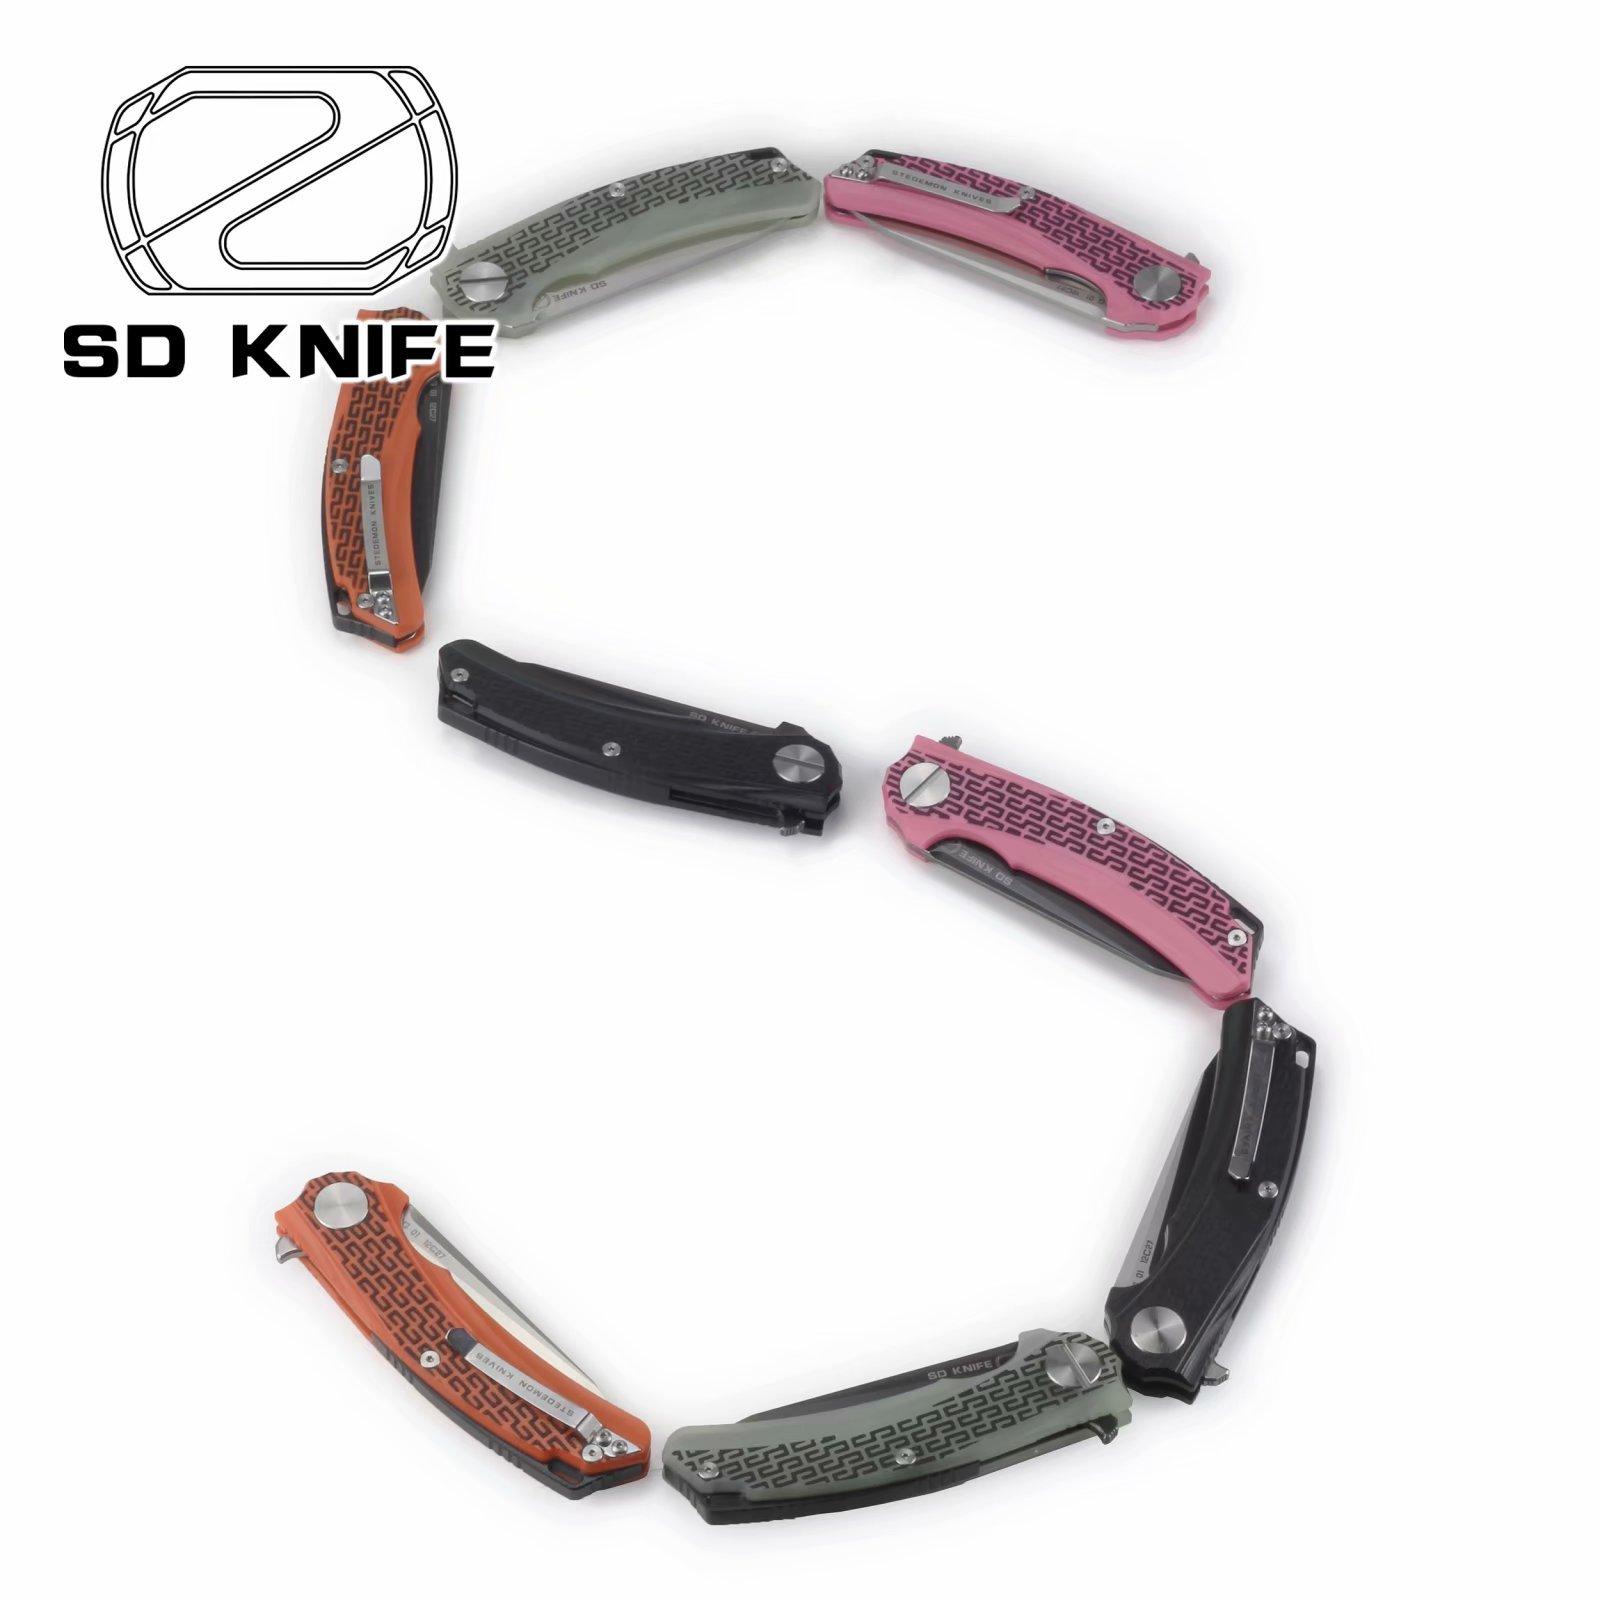 Stedemon Outdoor pocket folding Flipper knife - Tactical G10 Jade Handle - Swenden Sandvik 14C27N Stainless steel Satin Blade Finish - BG0103- Folded Knives